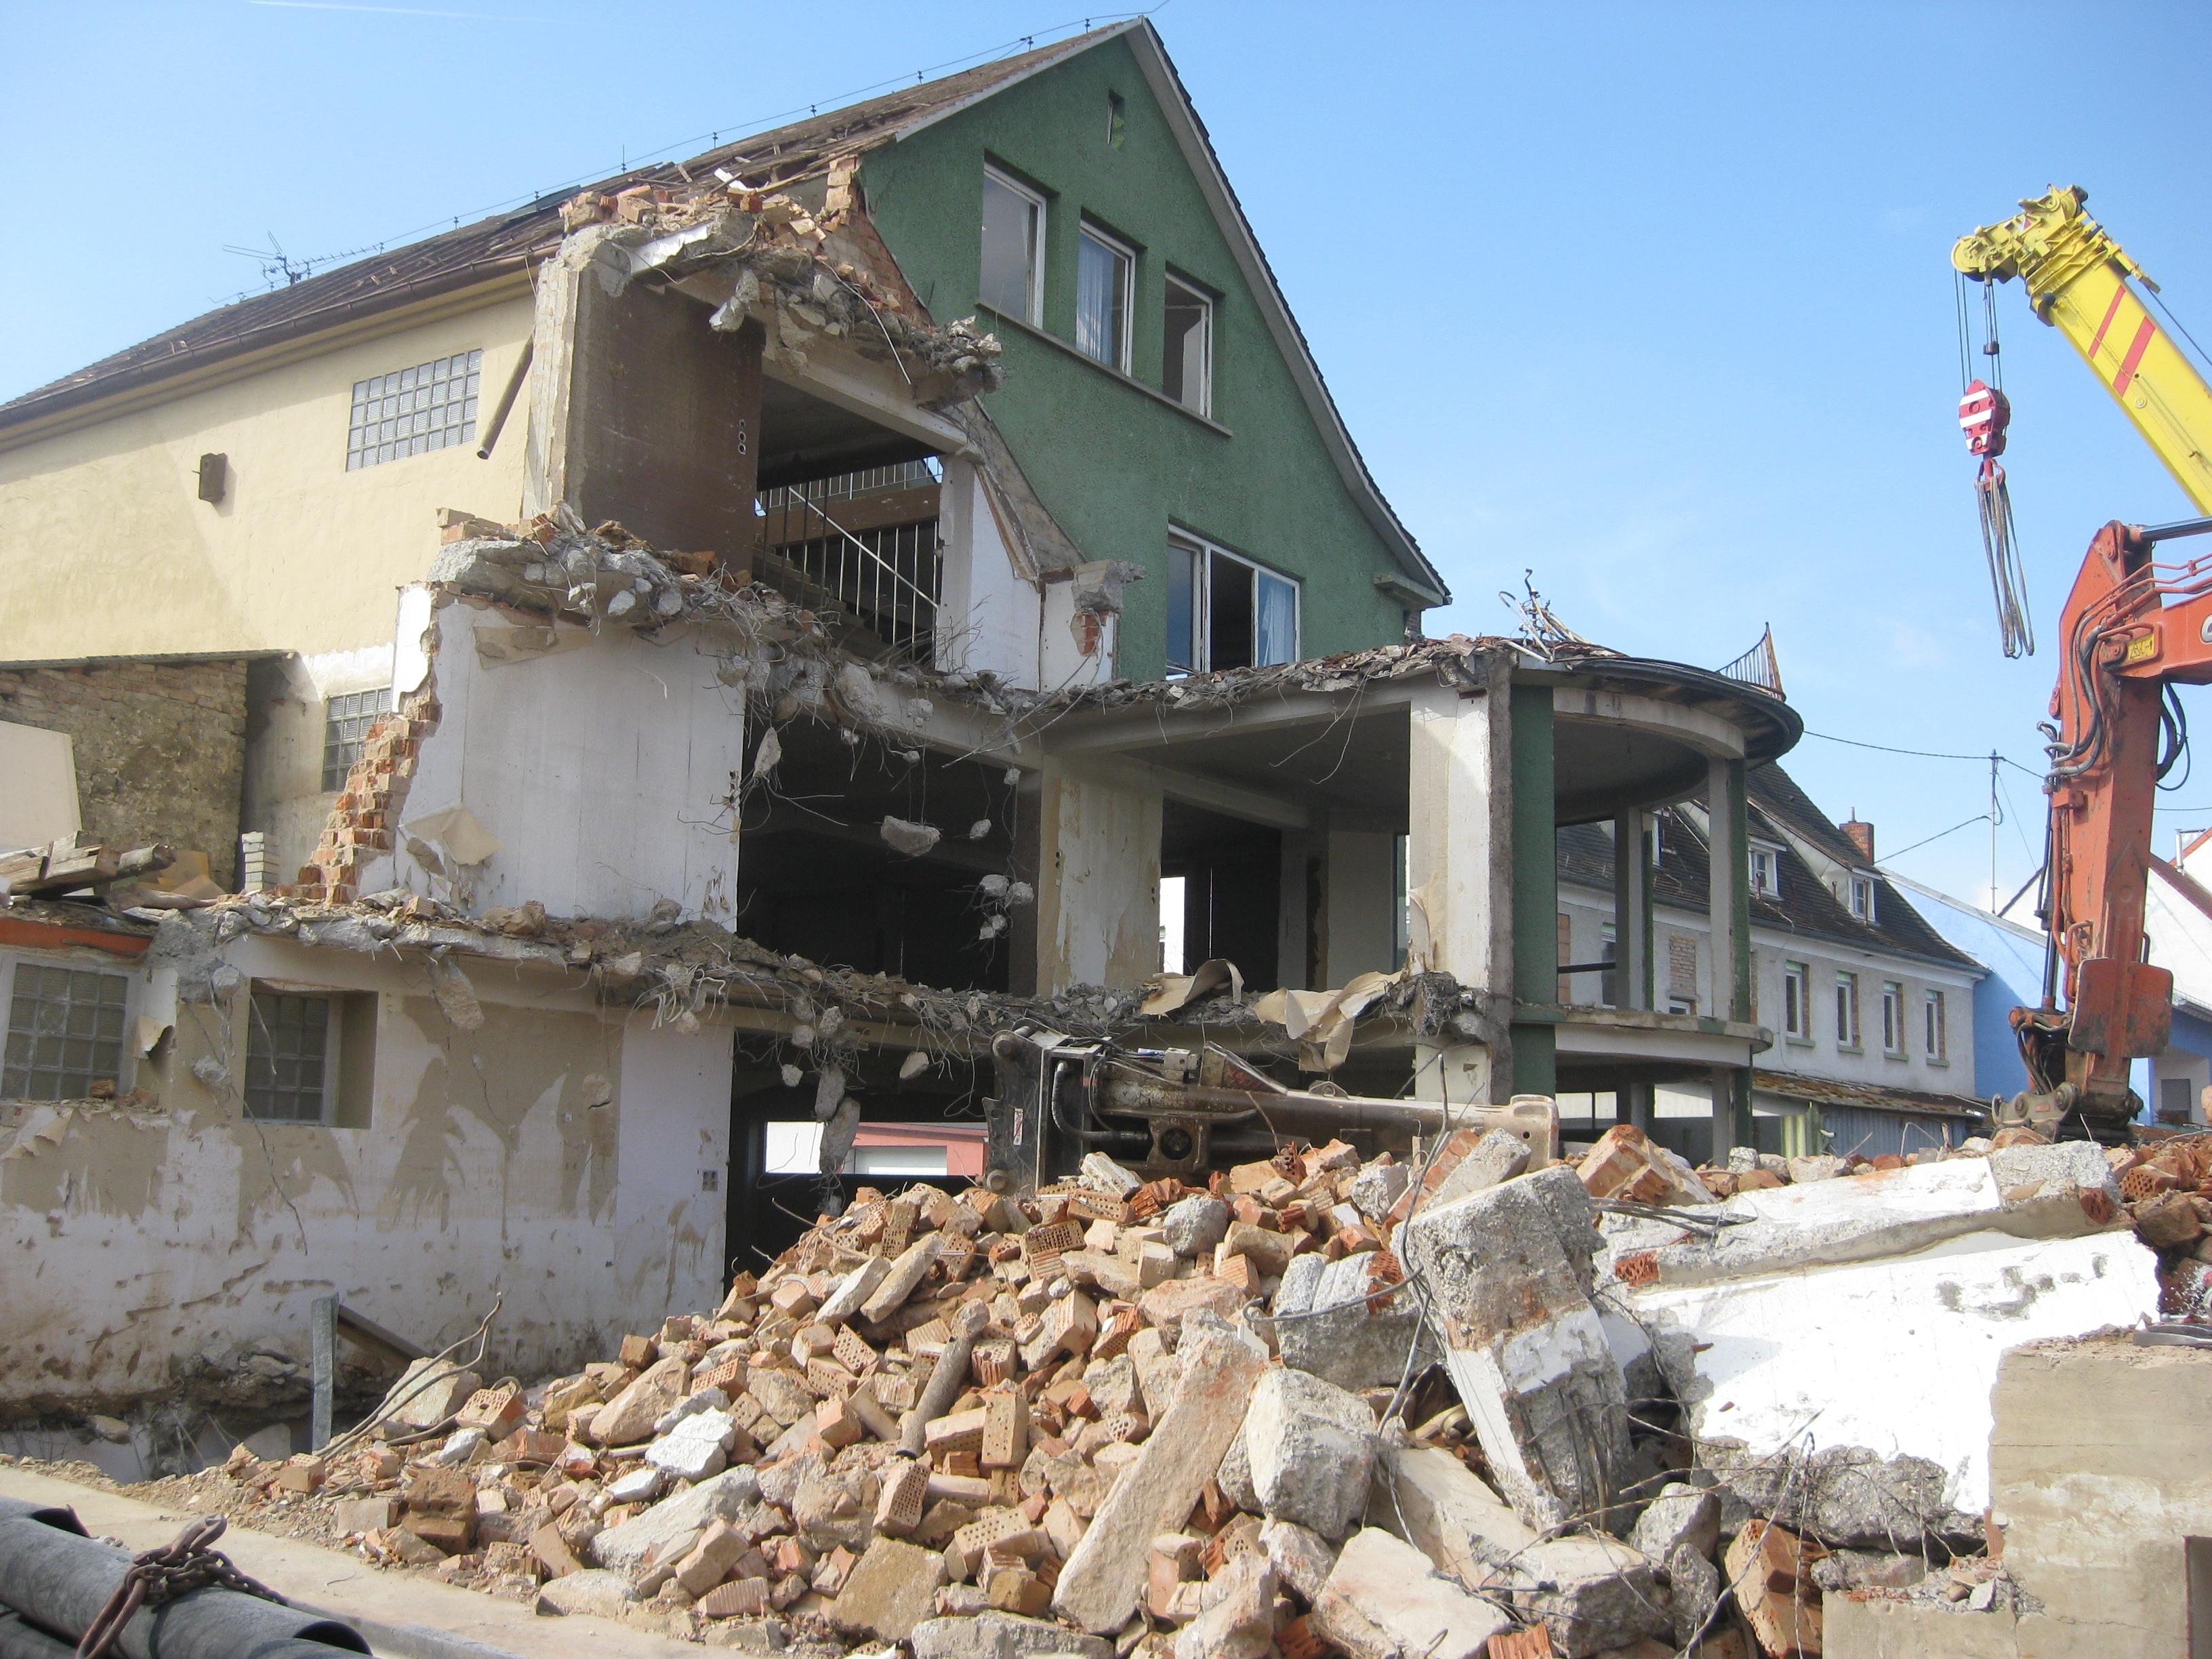 File:Demolition Of Furniture Store In Eschelbronn 2014 06